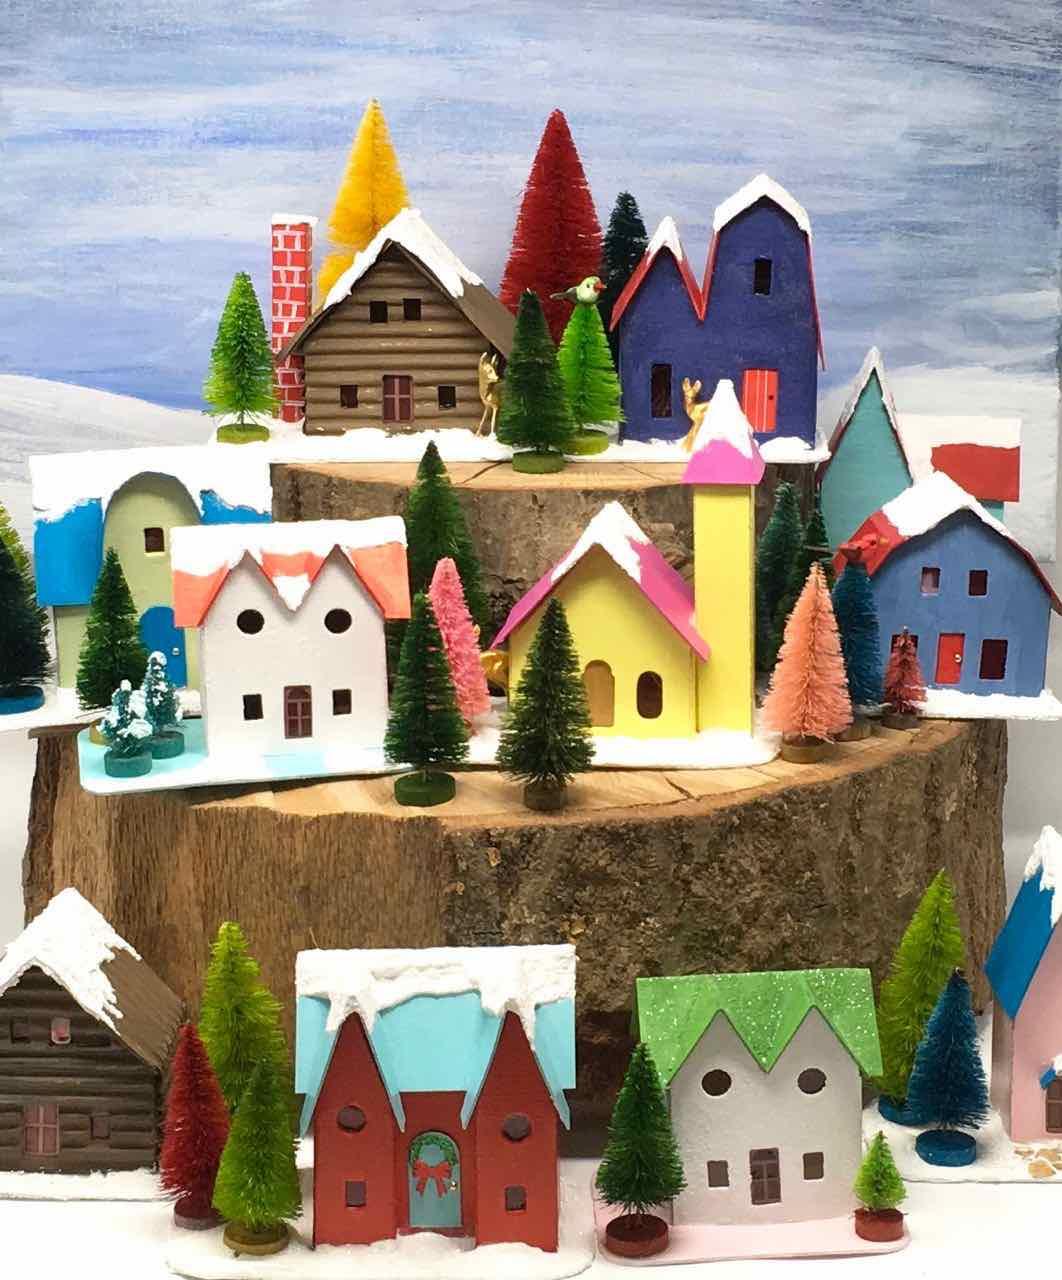 Christmas Houses Village.12 Houses For Christmas Challenge Paper Glitter Glue